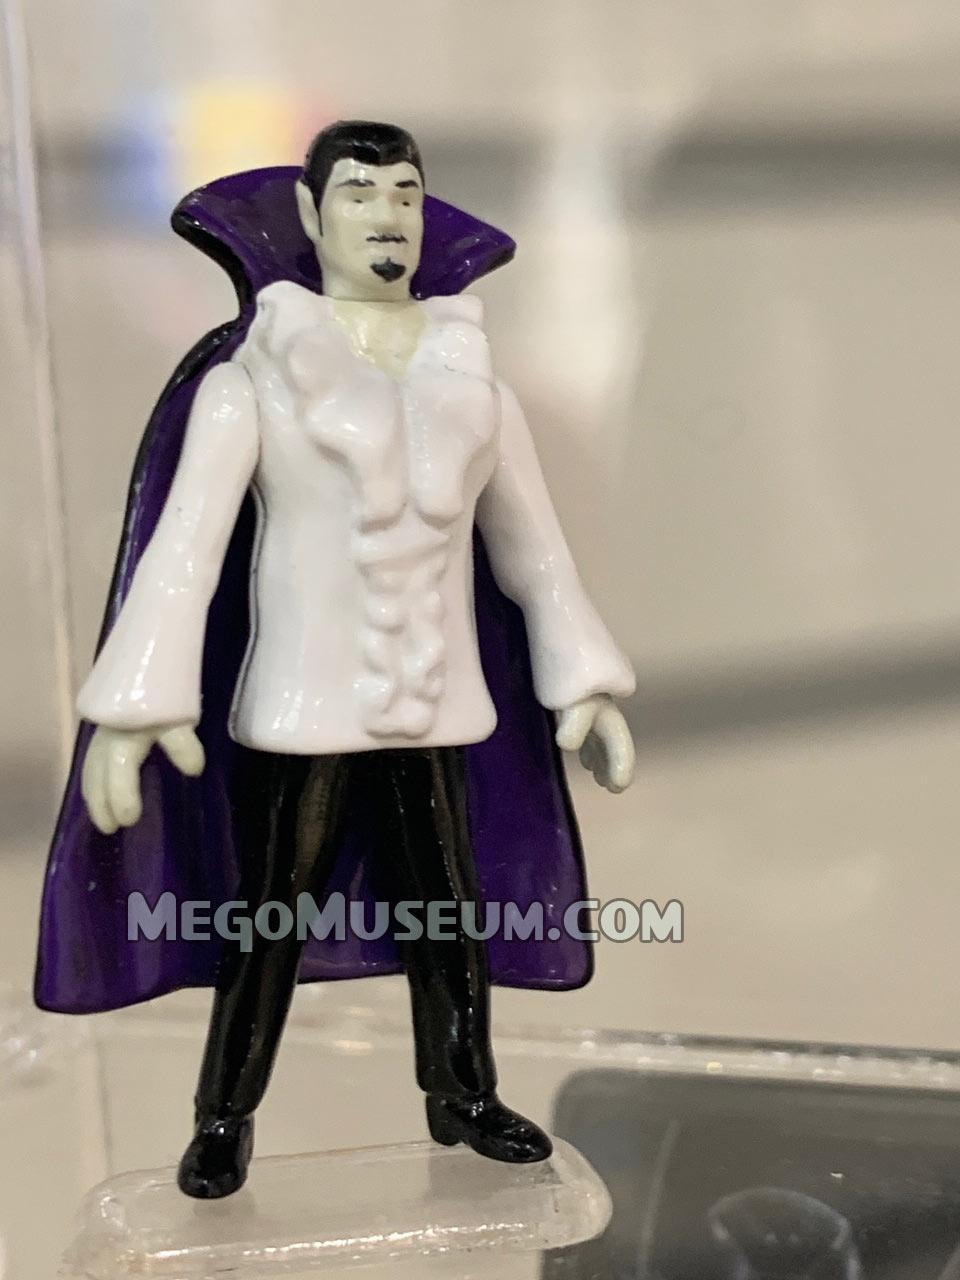 Worlds smallest Mego figures by Super Impulse